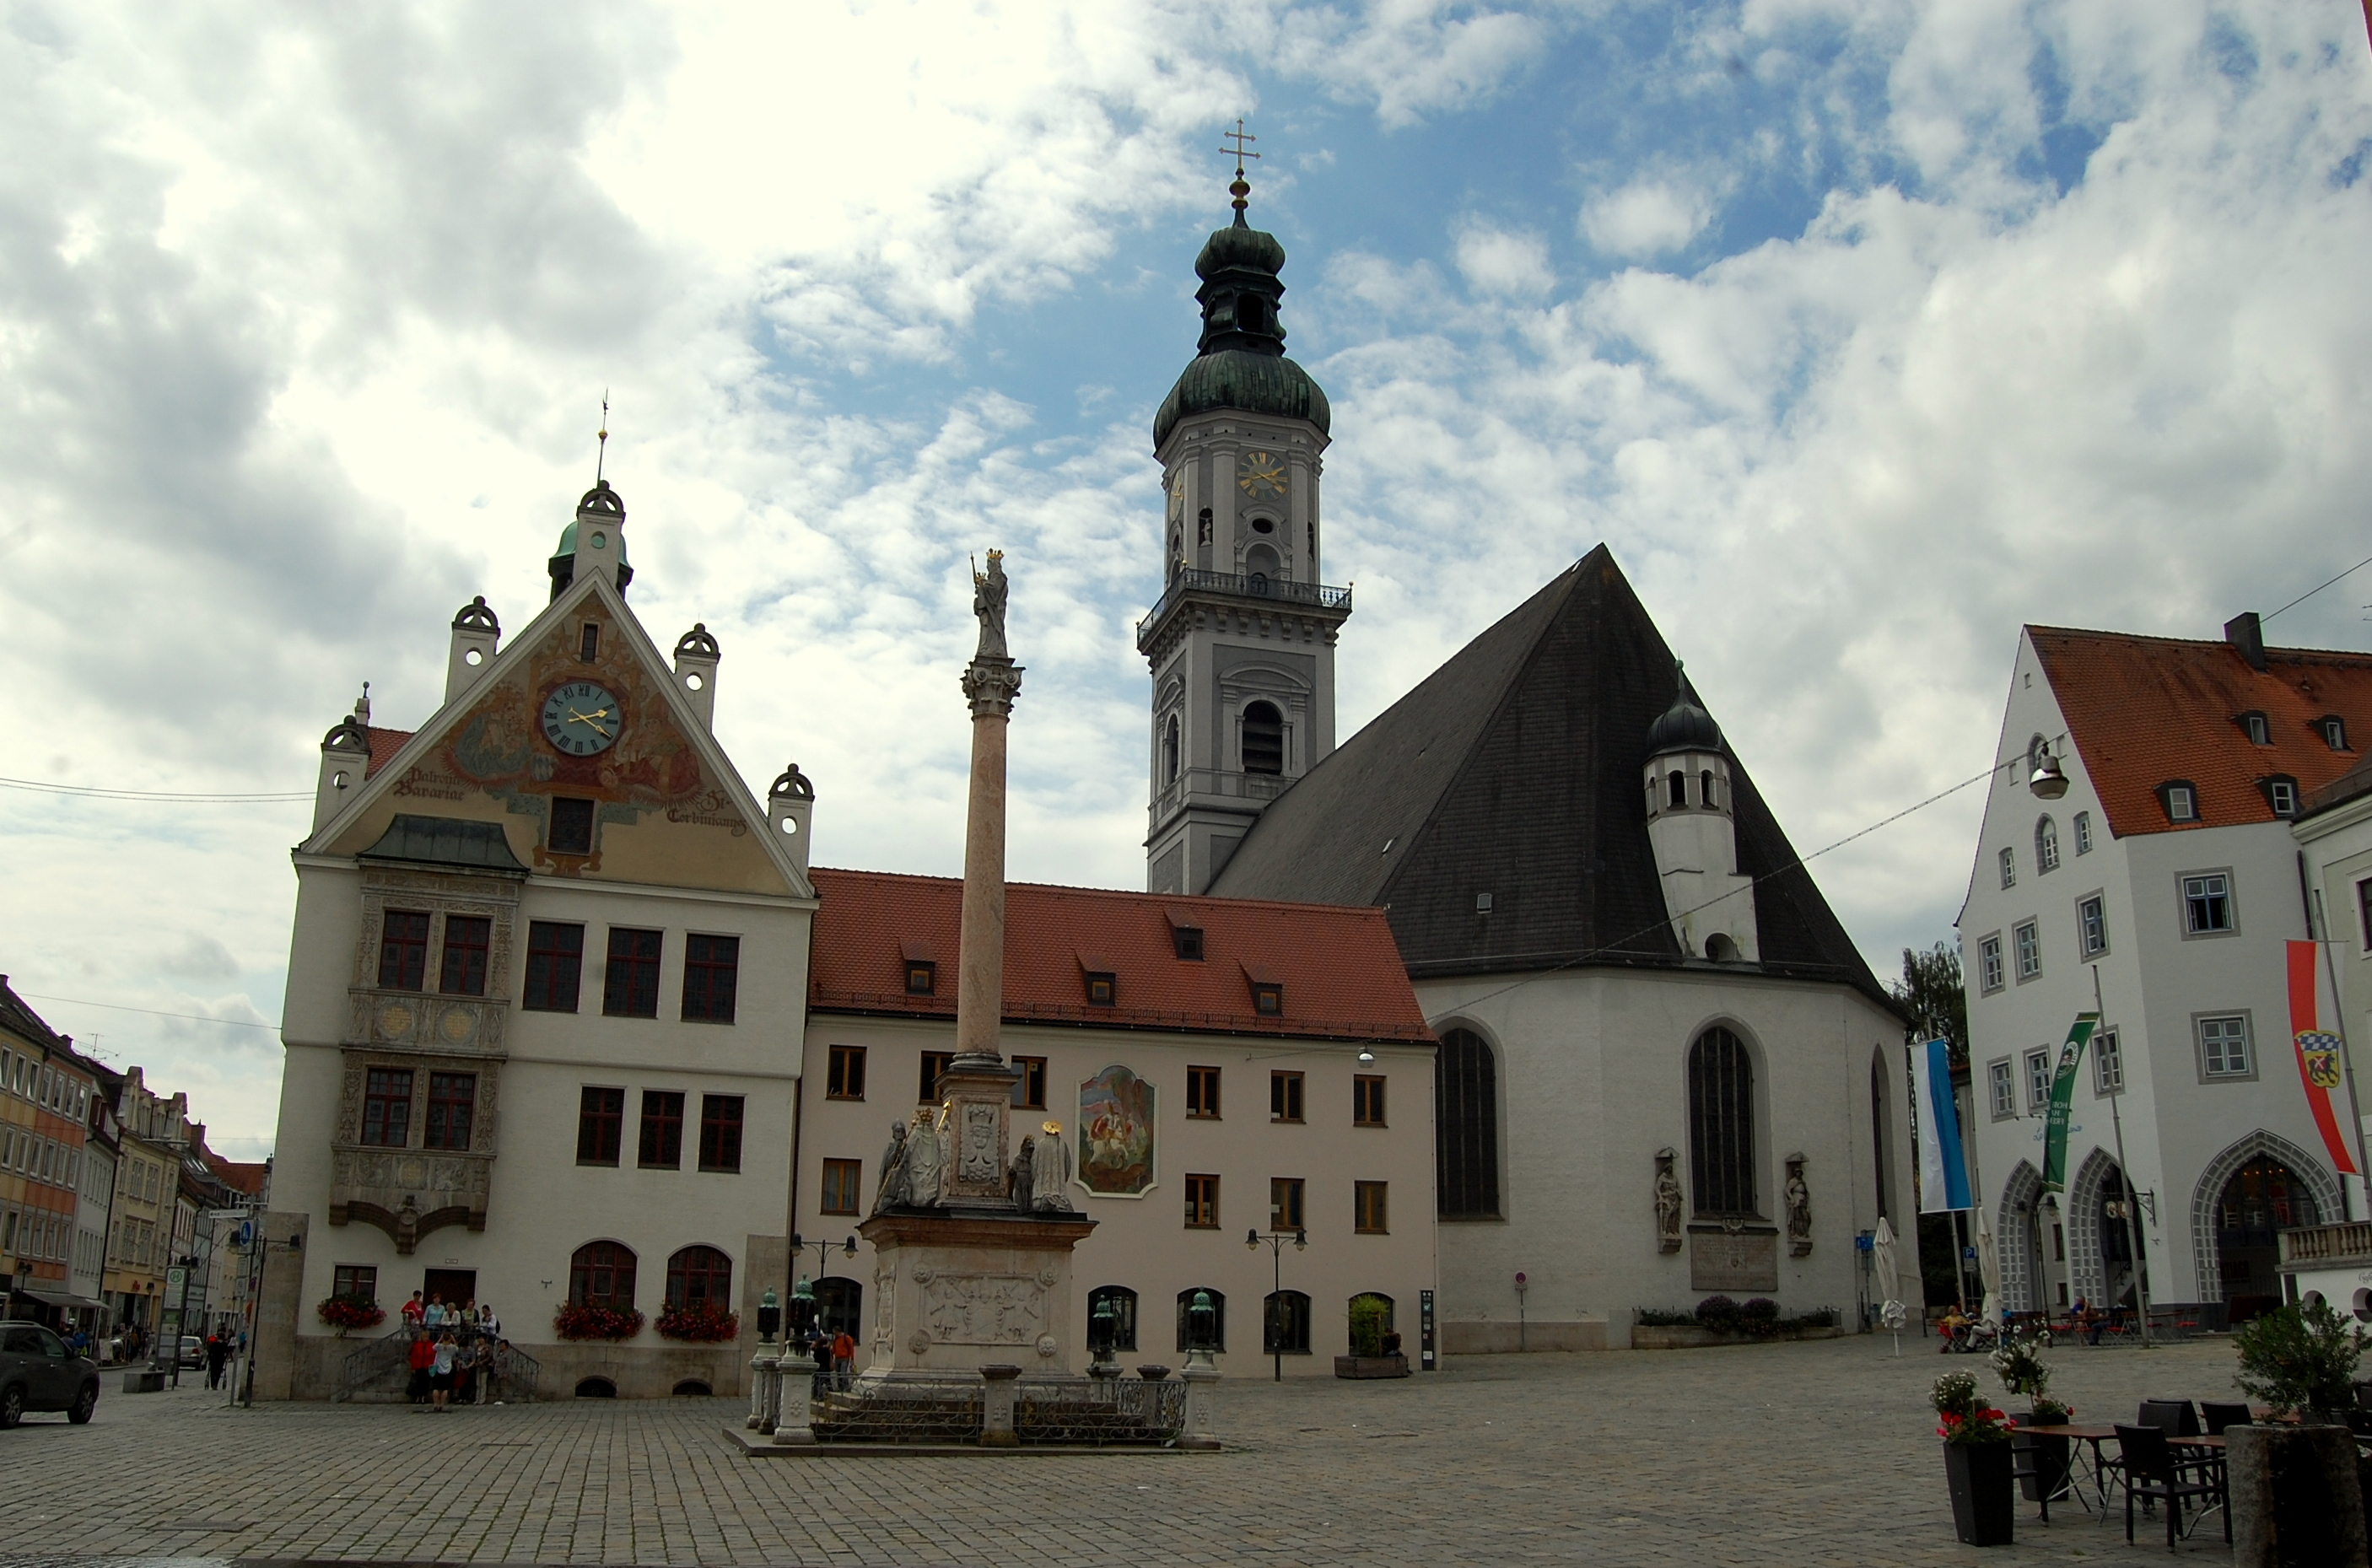 Day trip: Freising